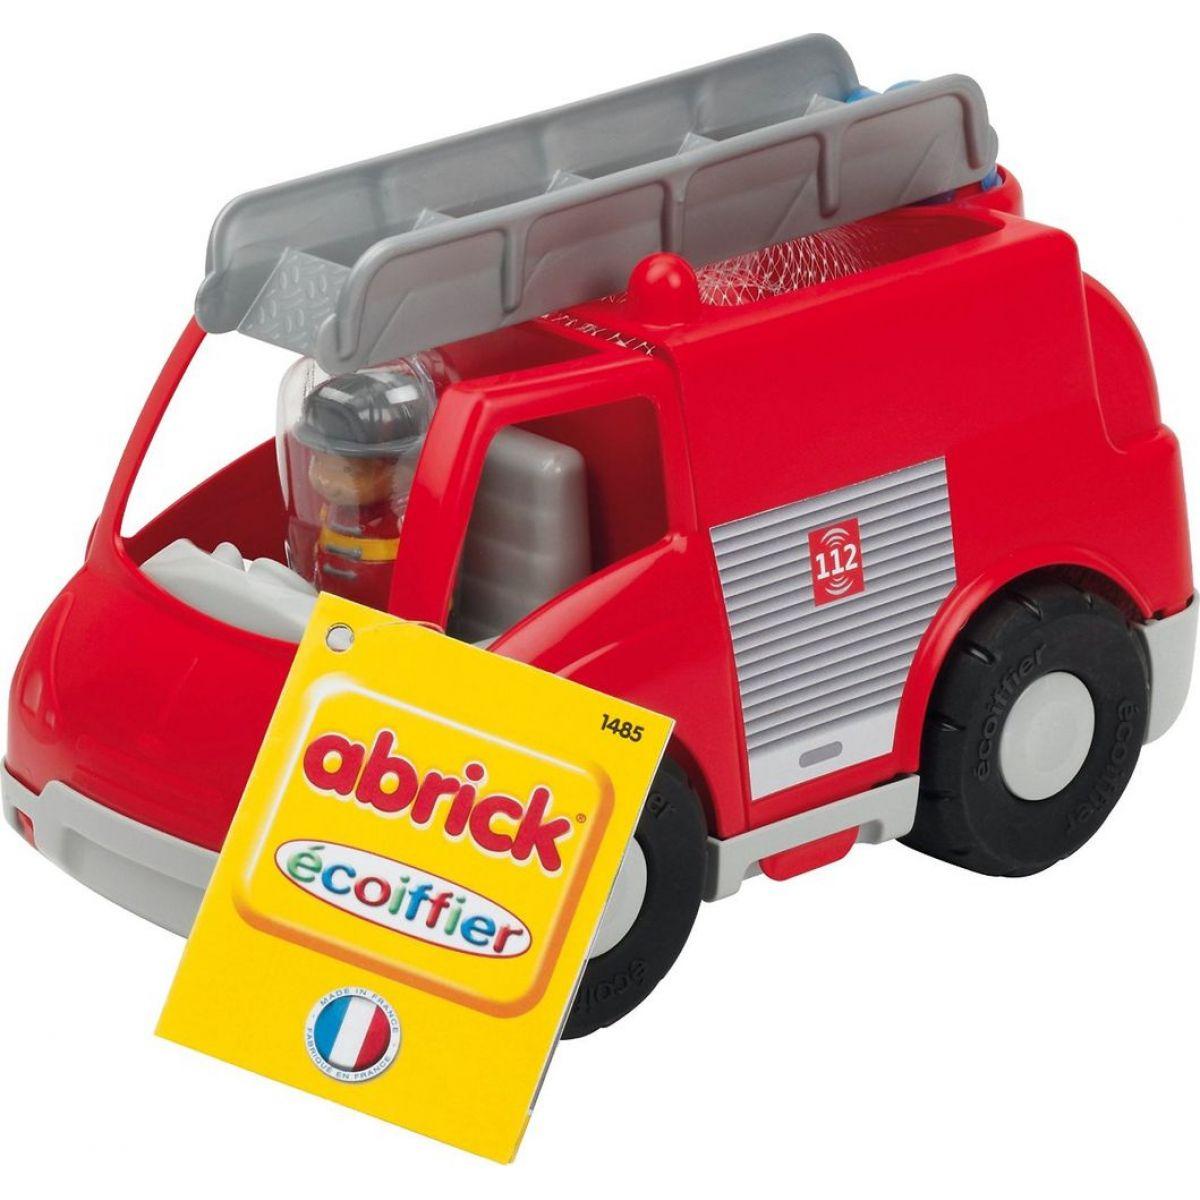 Abrick 1485 Hasičské auto s kostkami